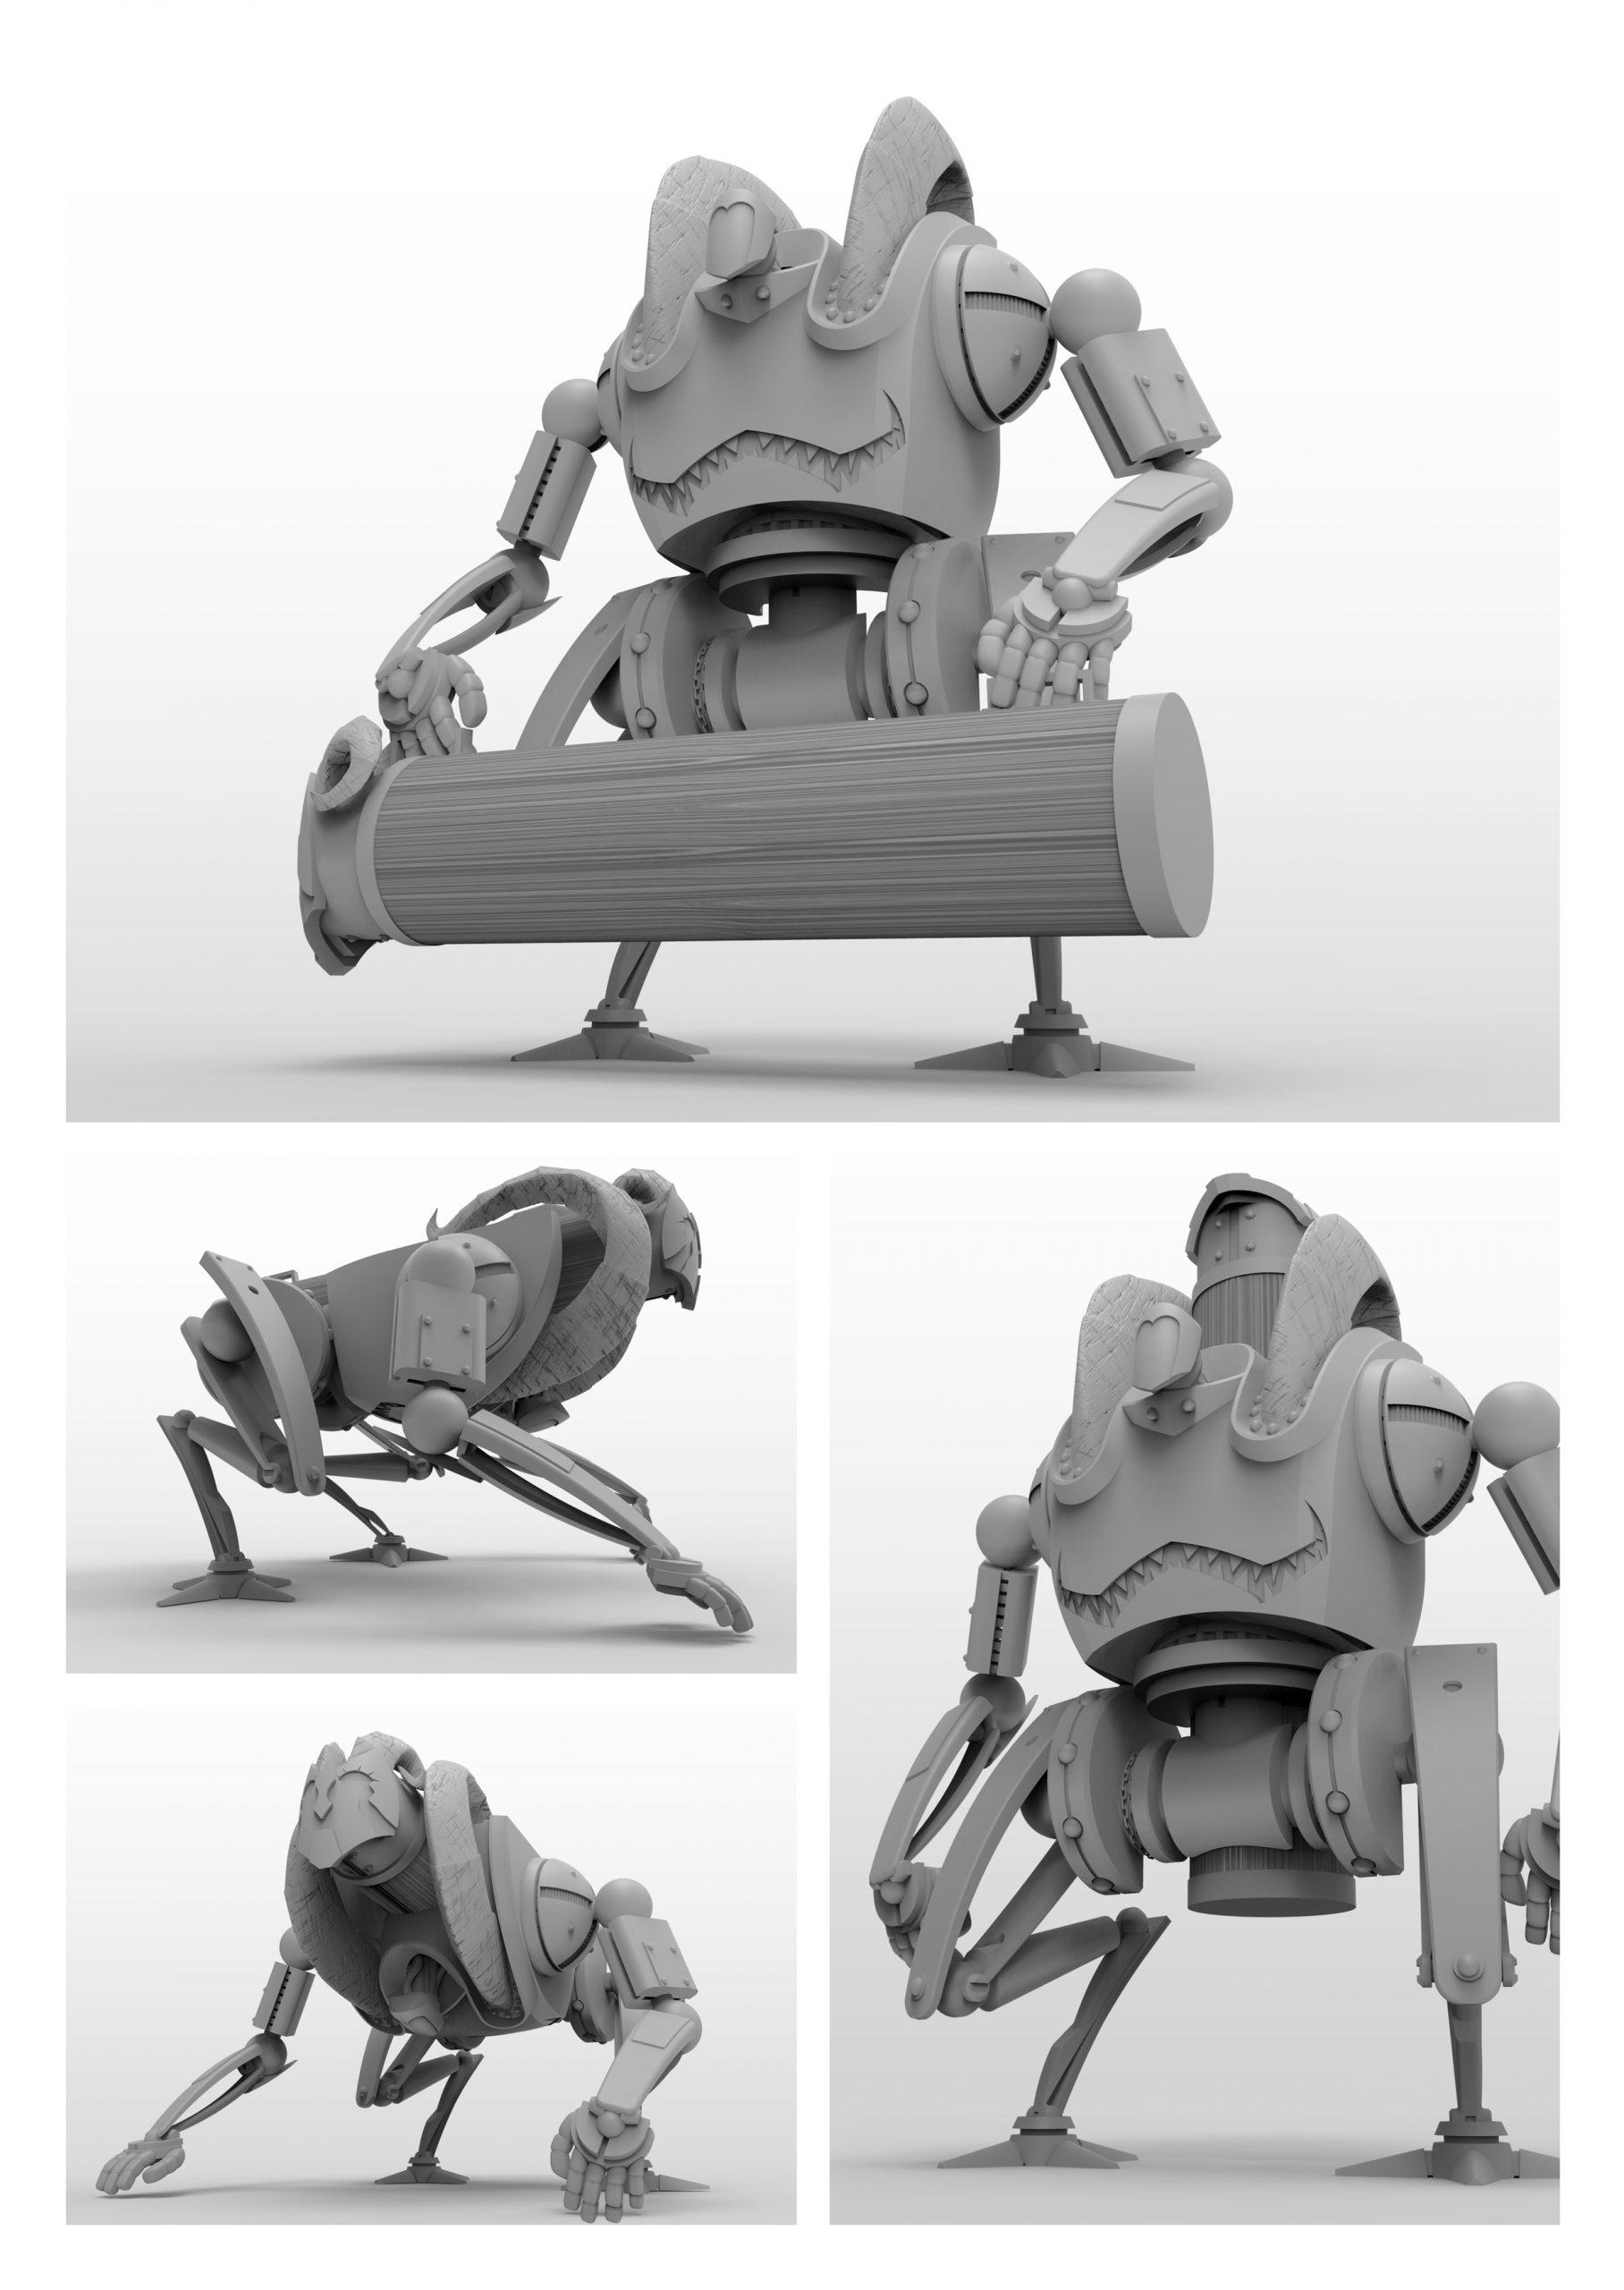 Megarette - Robottoni